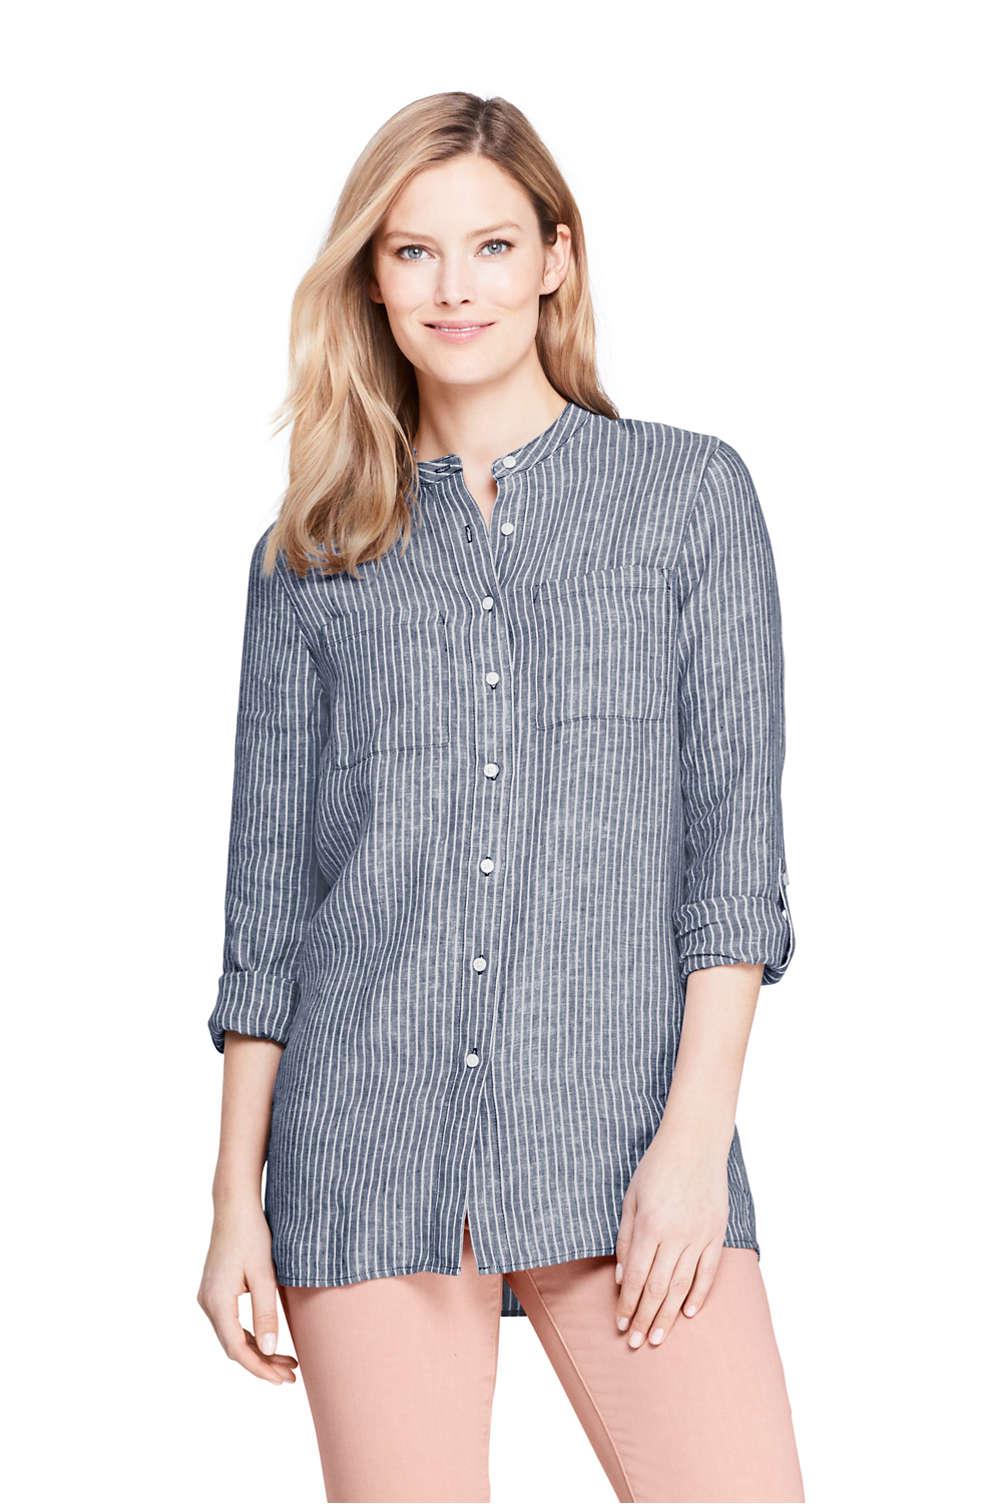 429f7d1b45 Women's Linen Roll Long Sleeve Tunic Top - Pattern from Lands' End